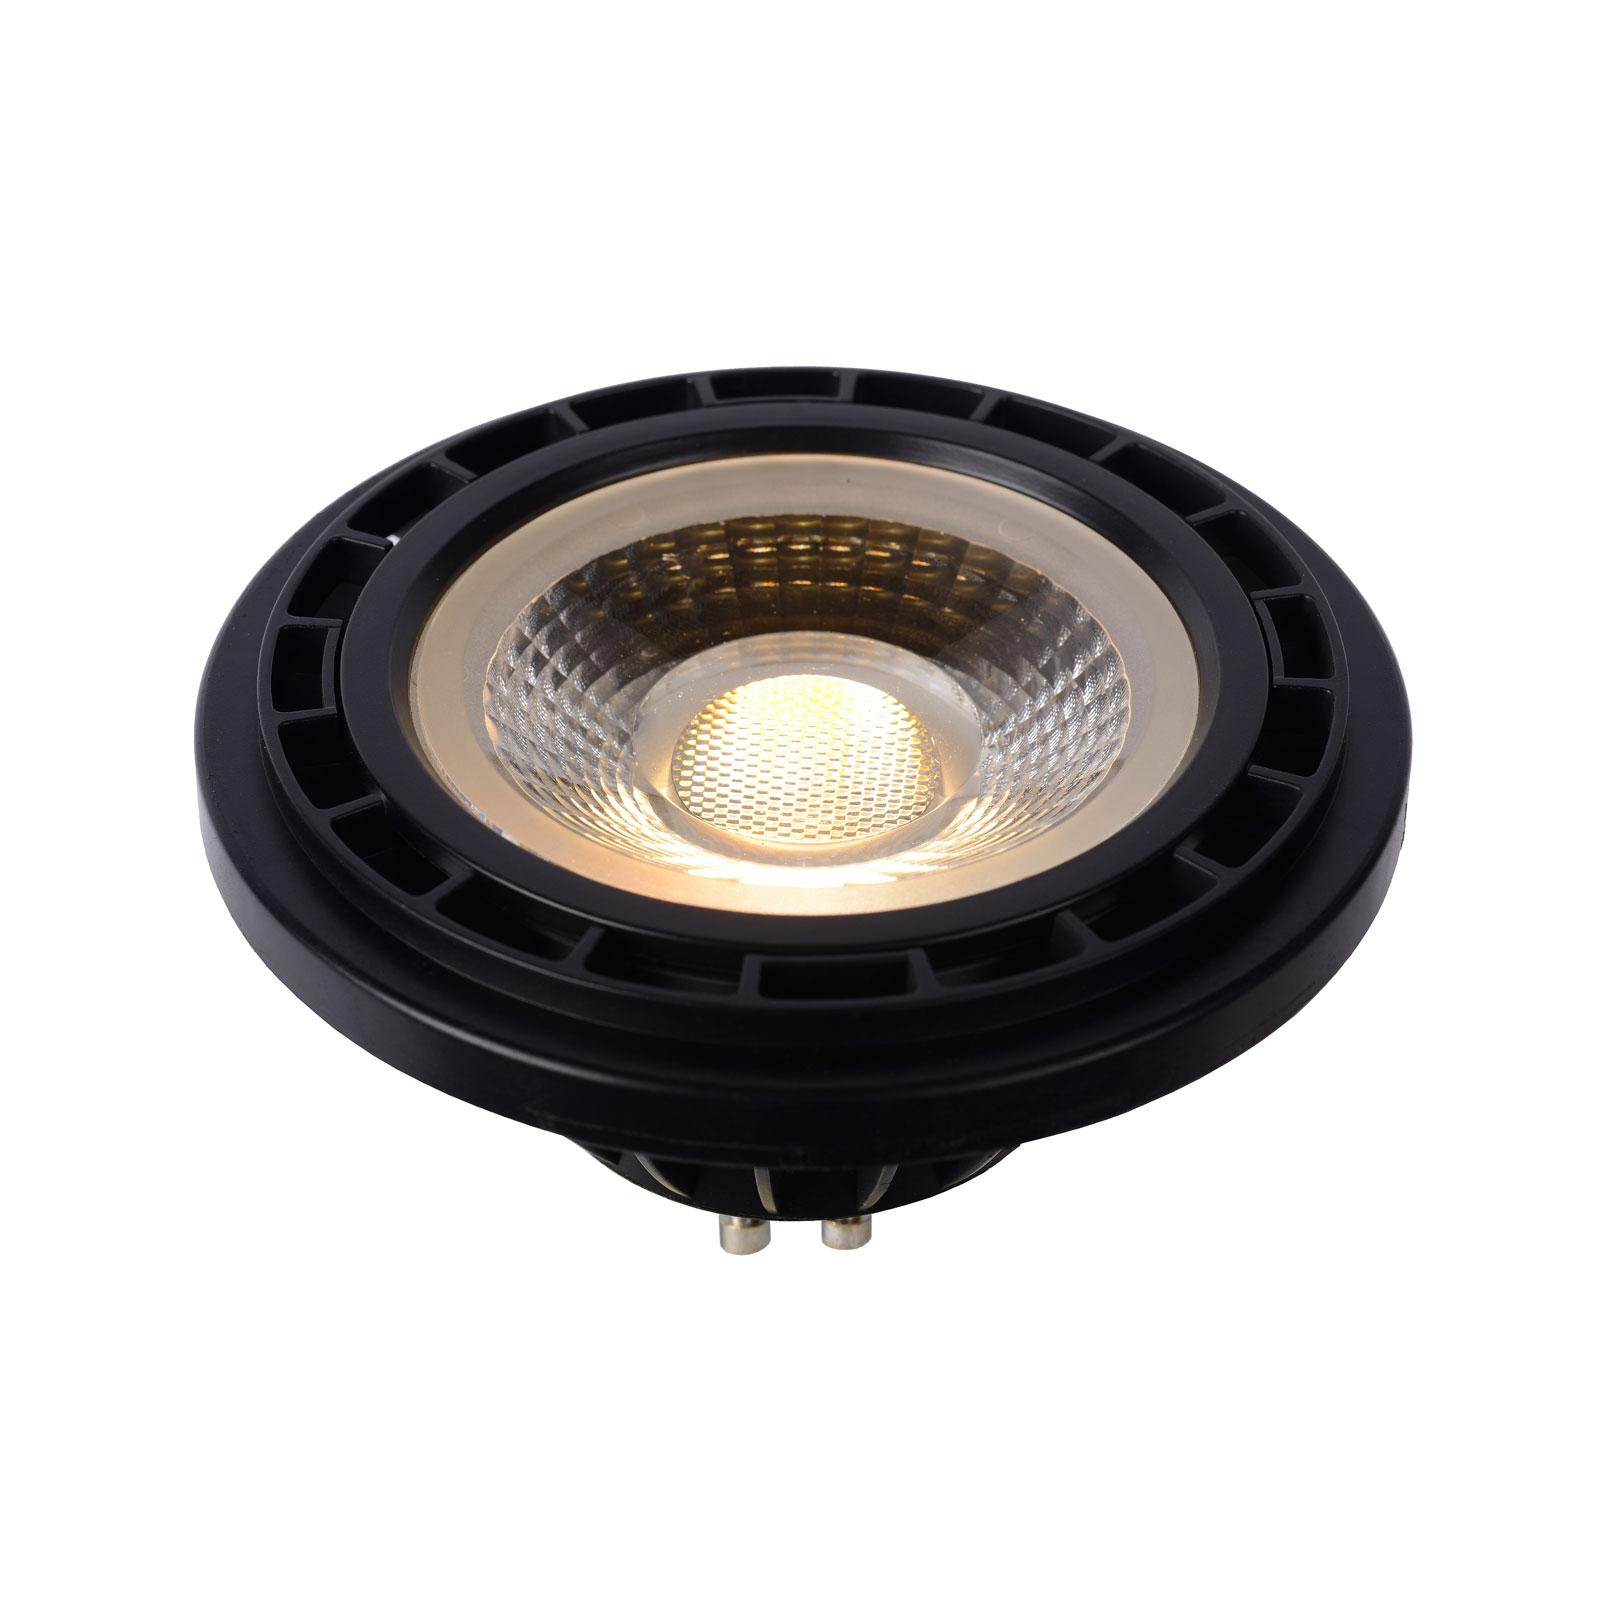 GU10 LED-reflektor 12W 3000K dim to warm, svart